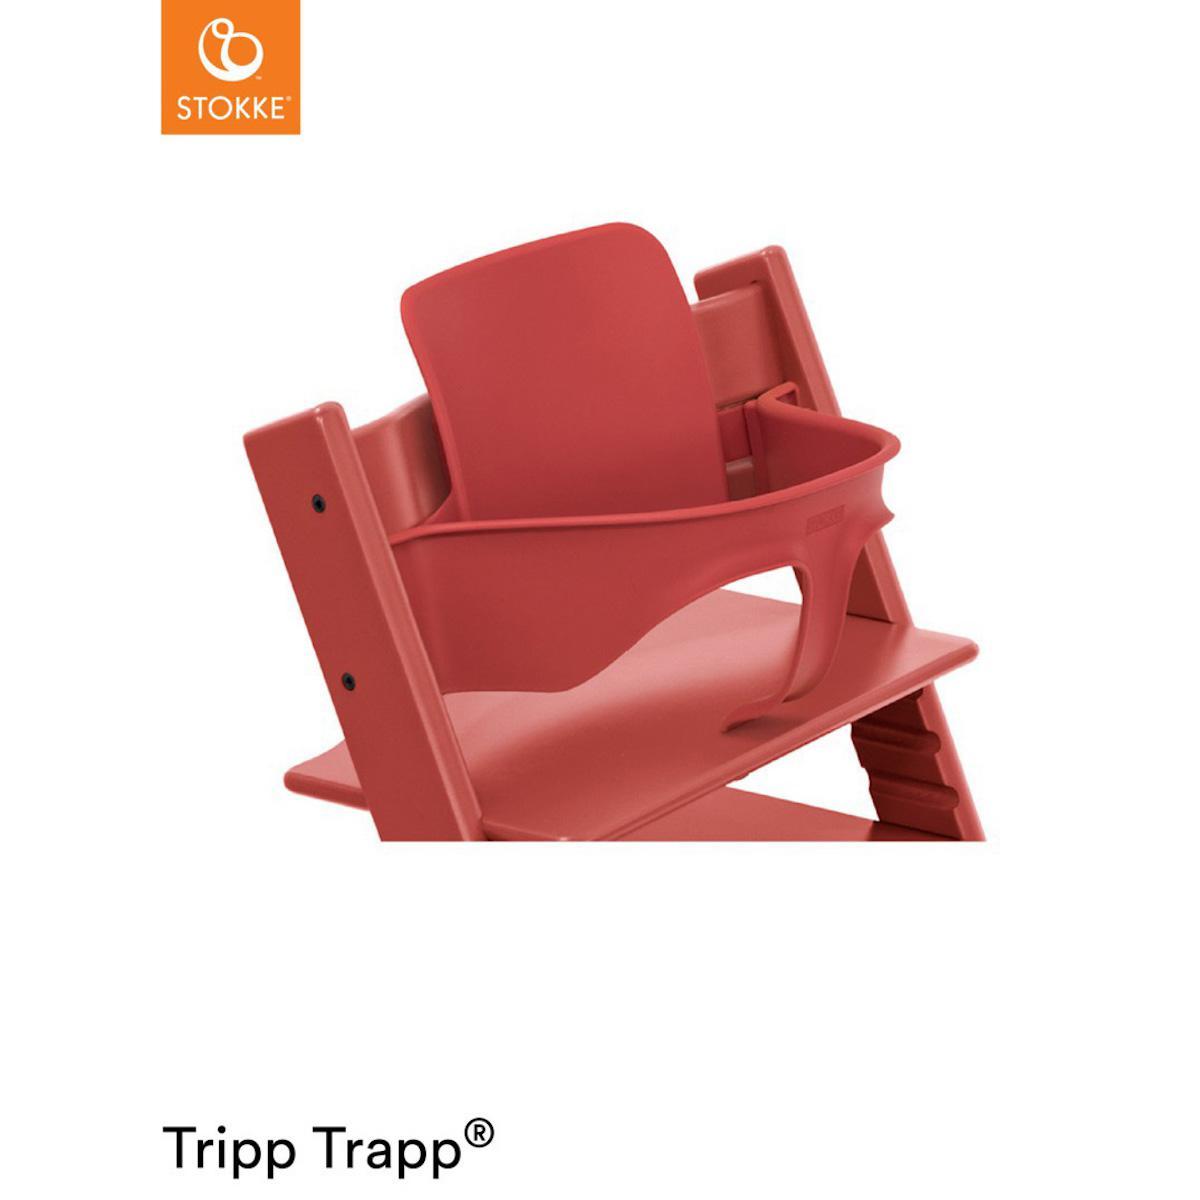 Baby Set Hochstuhl TRIPP TRAPP Stokke Warm Red